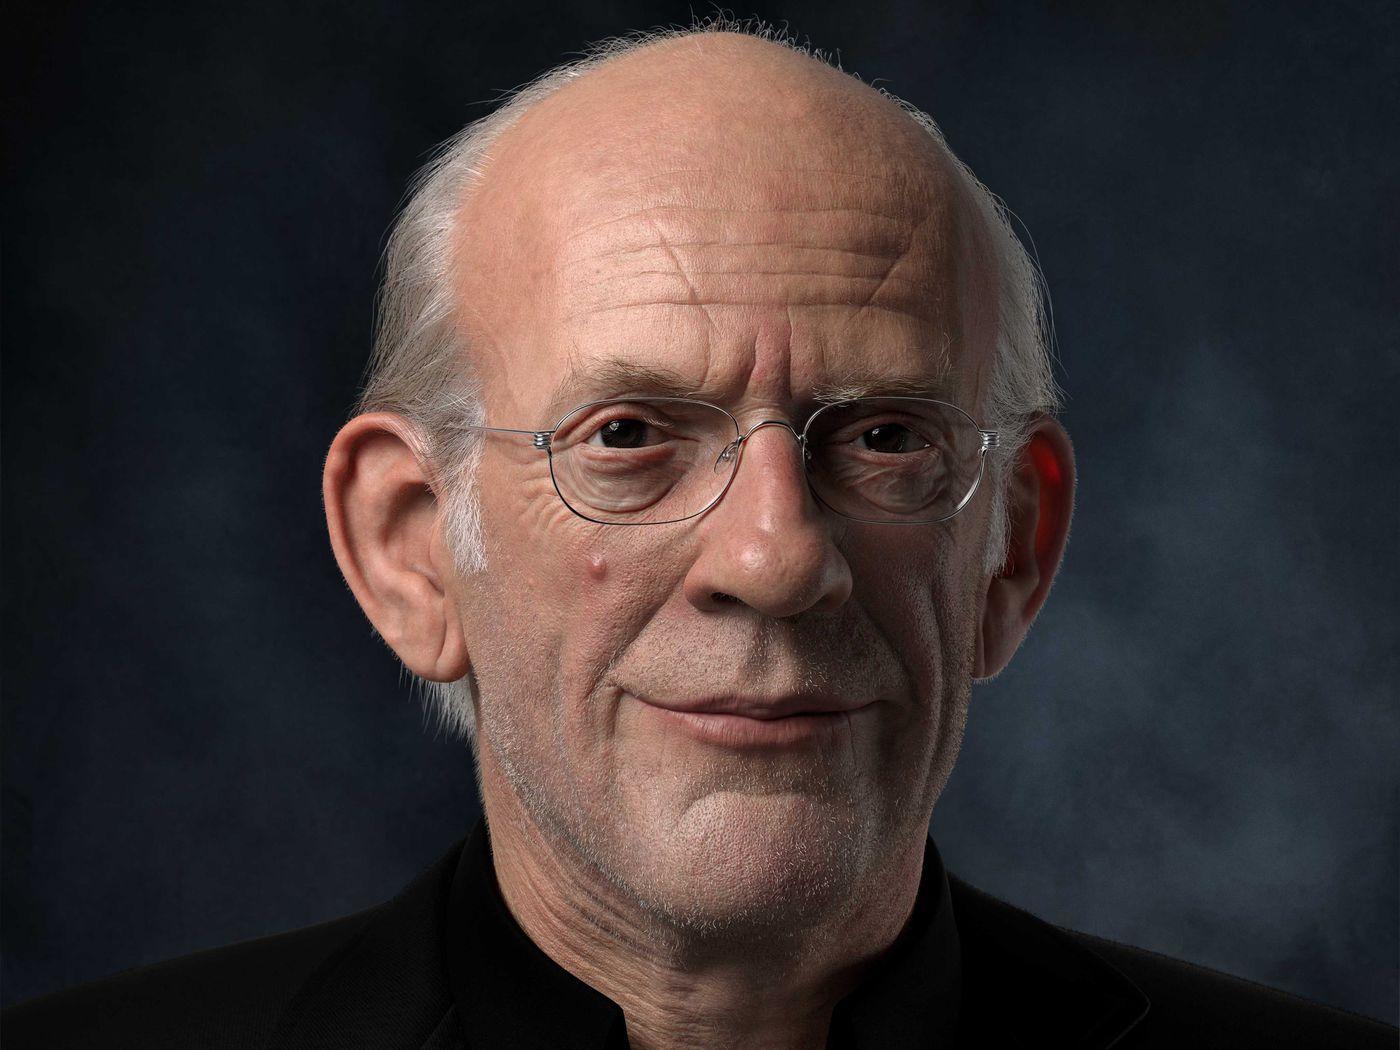 Portrait of Christopher Lloyd